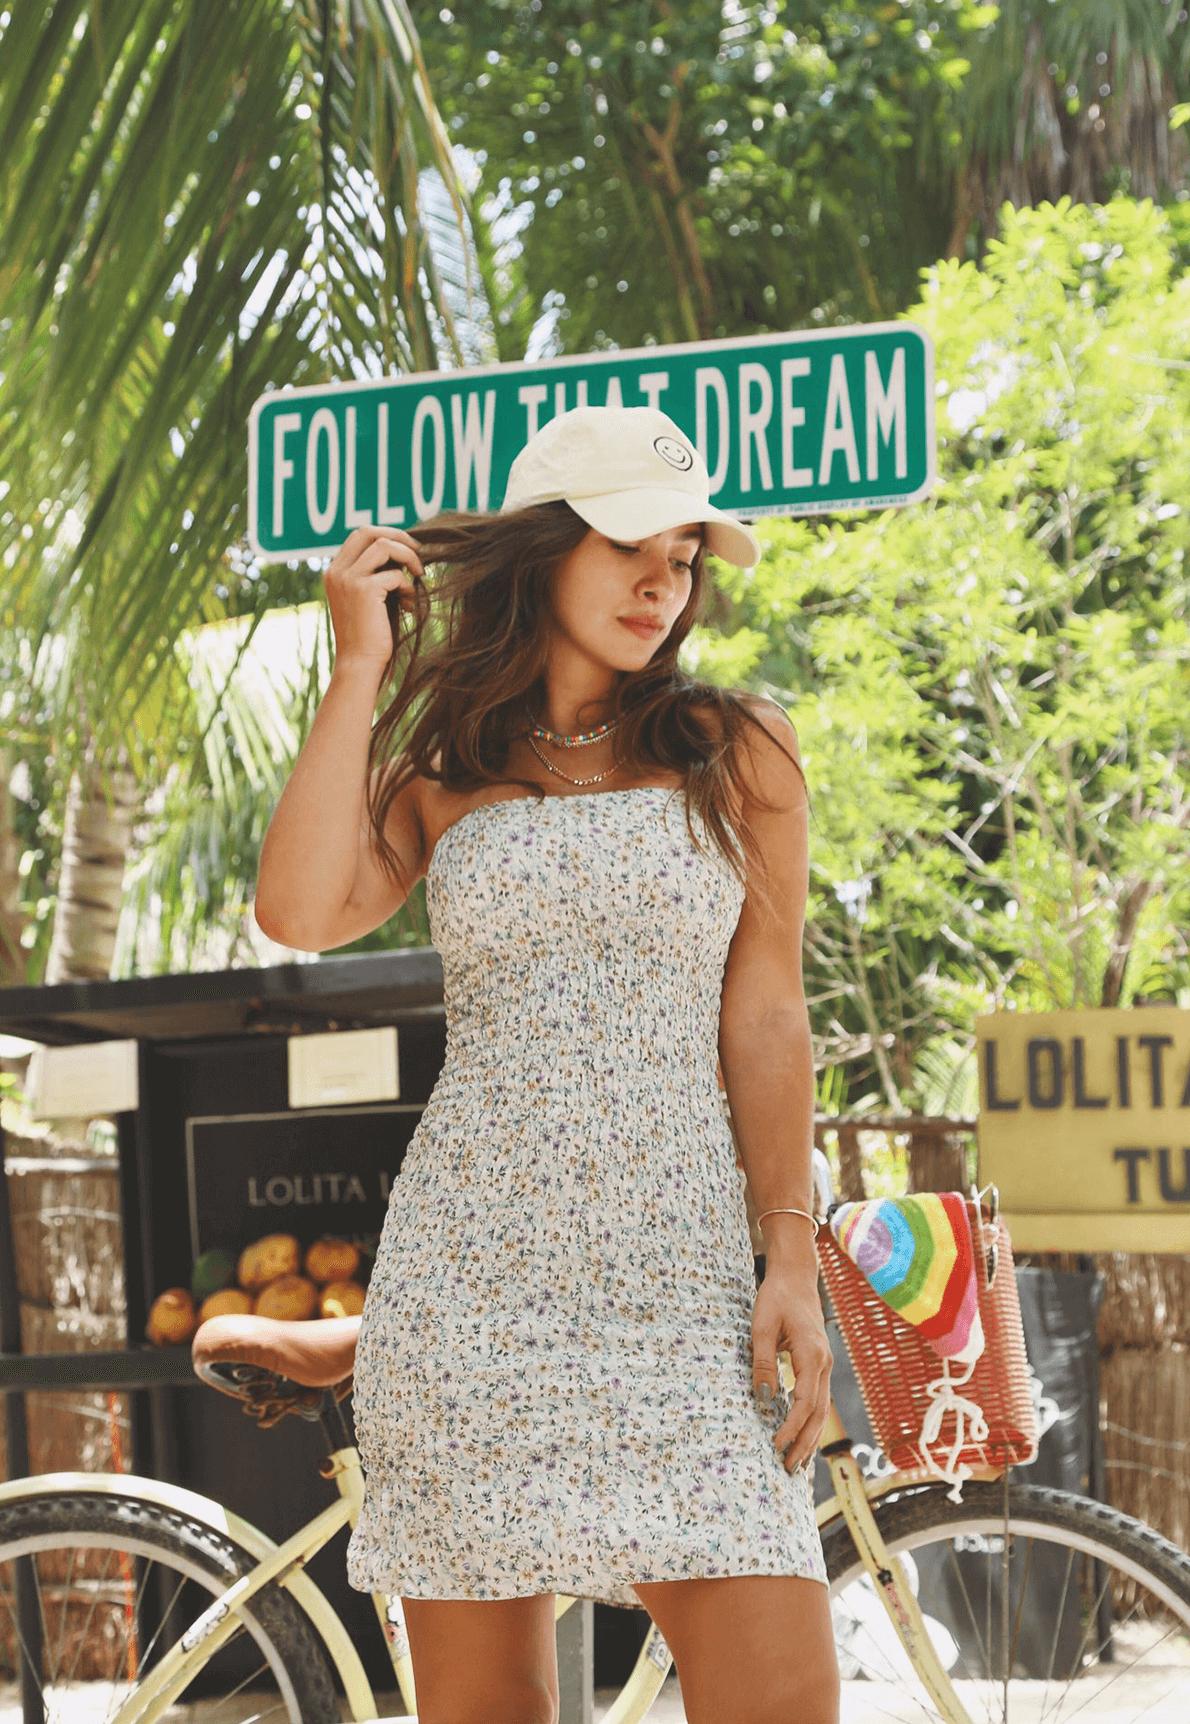 35859-vestido-guadalajara-mundo-lolita-08